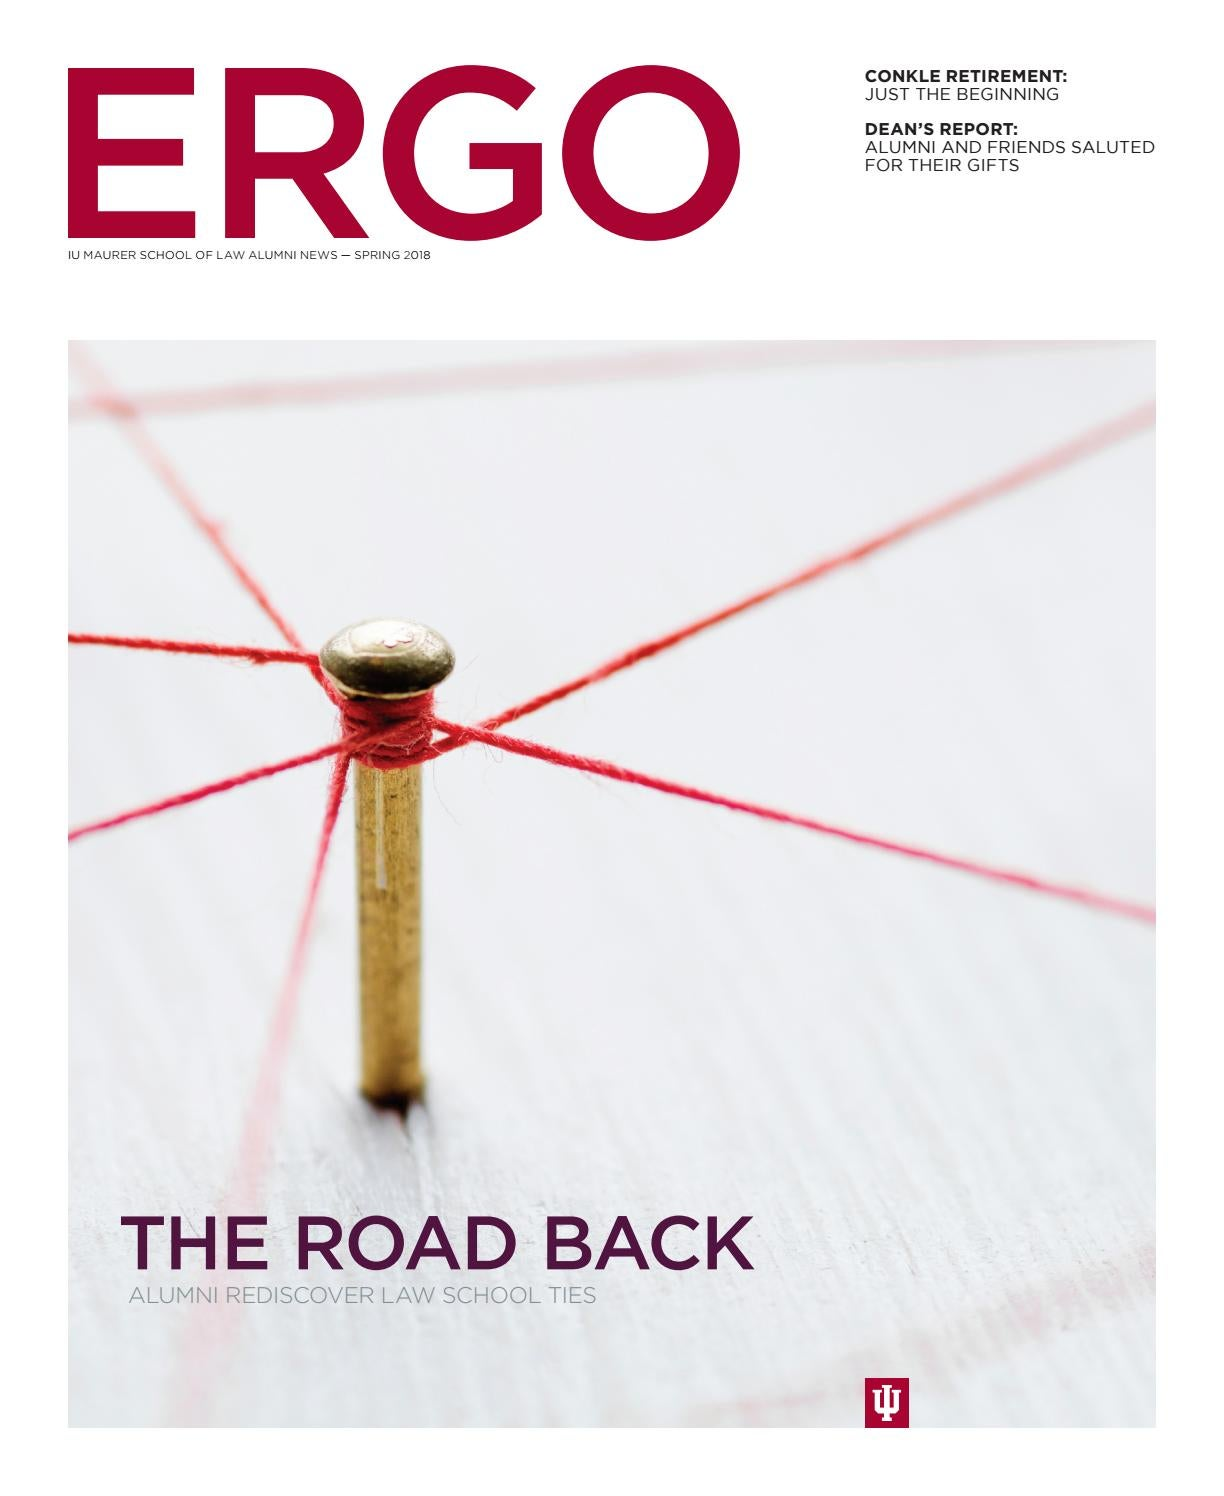 ERGO, Spring 2018 by Ken Turchi - issuu